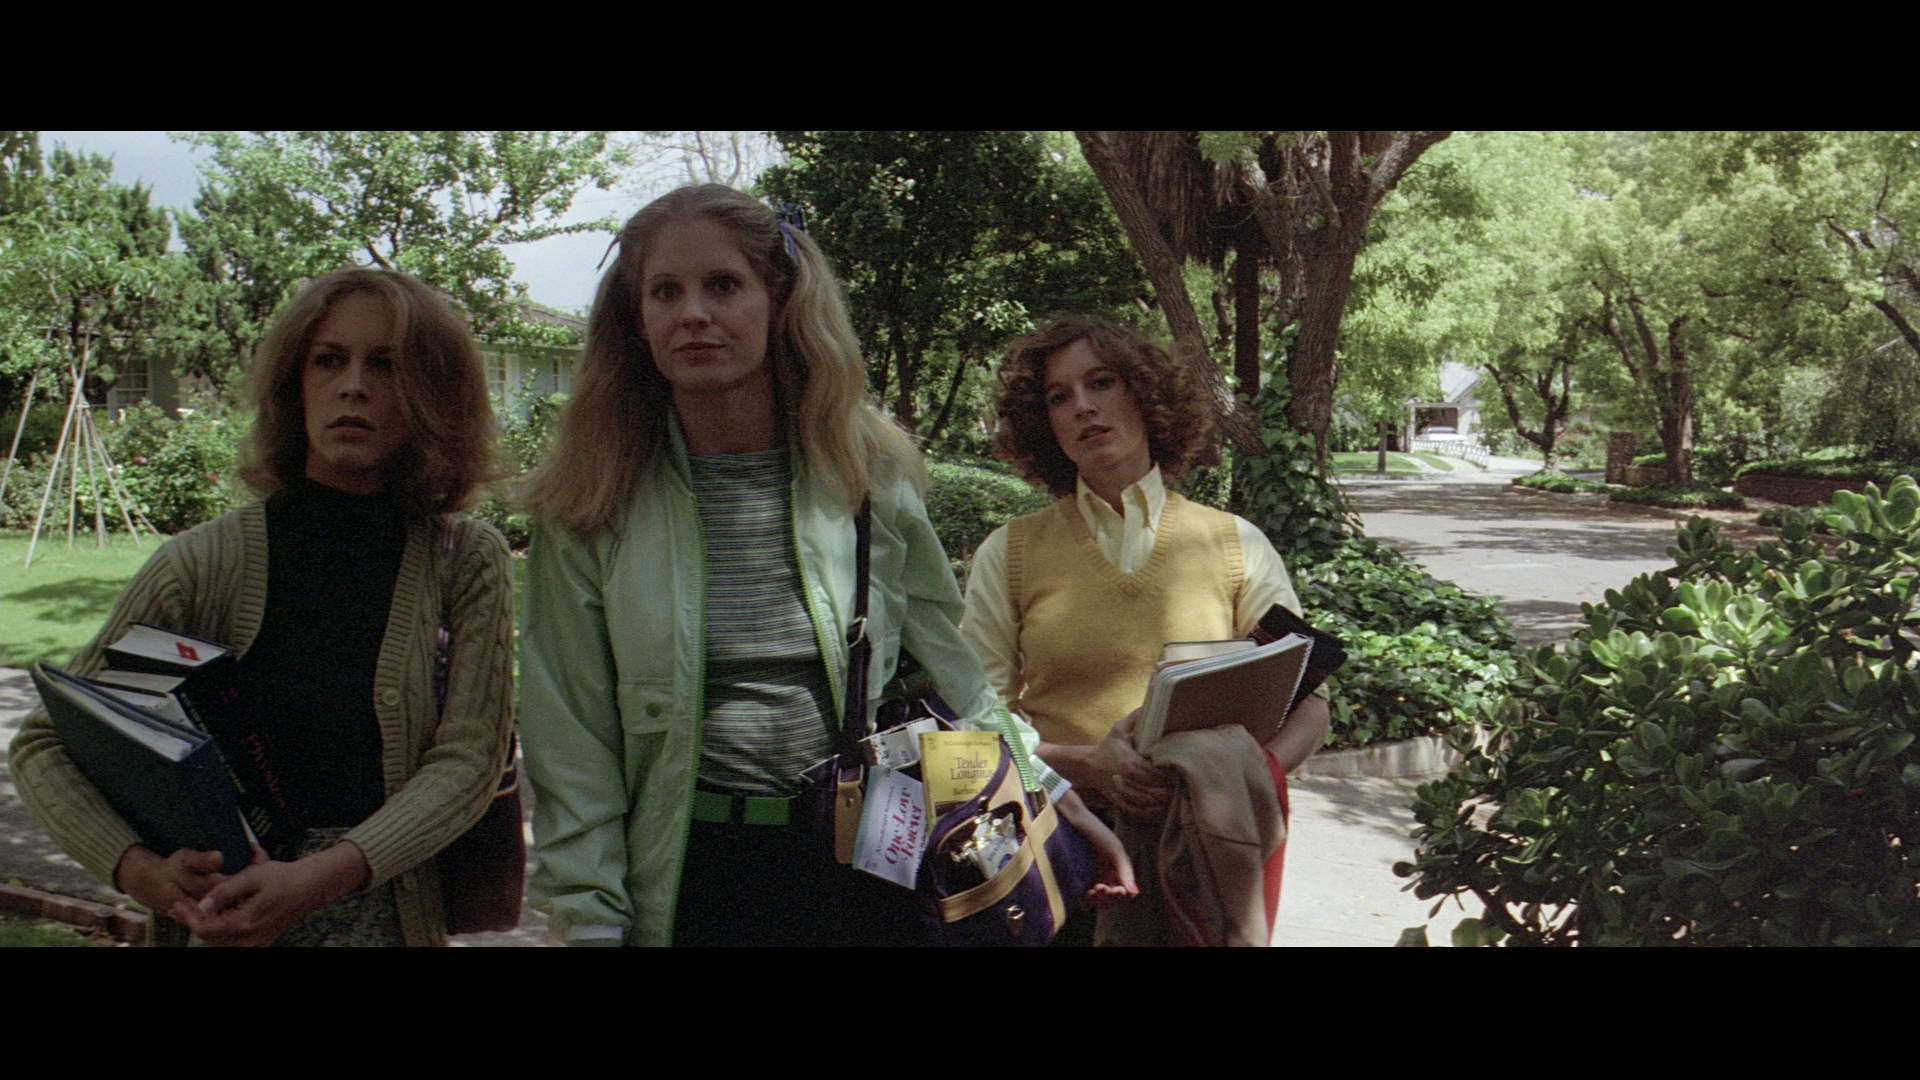 Halloween (35th Anniversary Edition) (Blu-ray) : DVD Talk Review ...